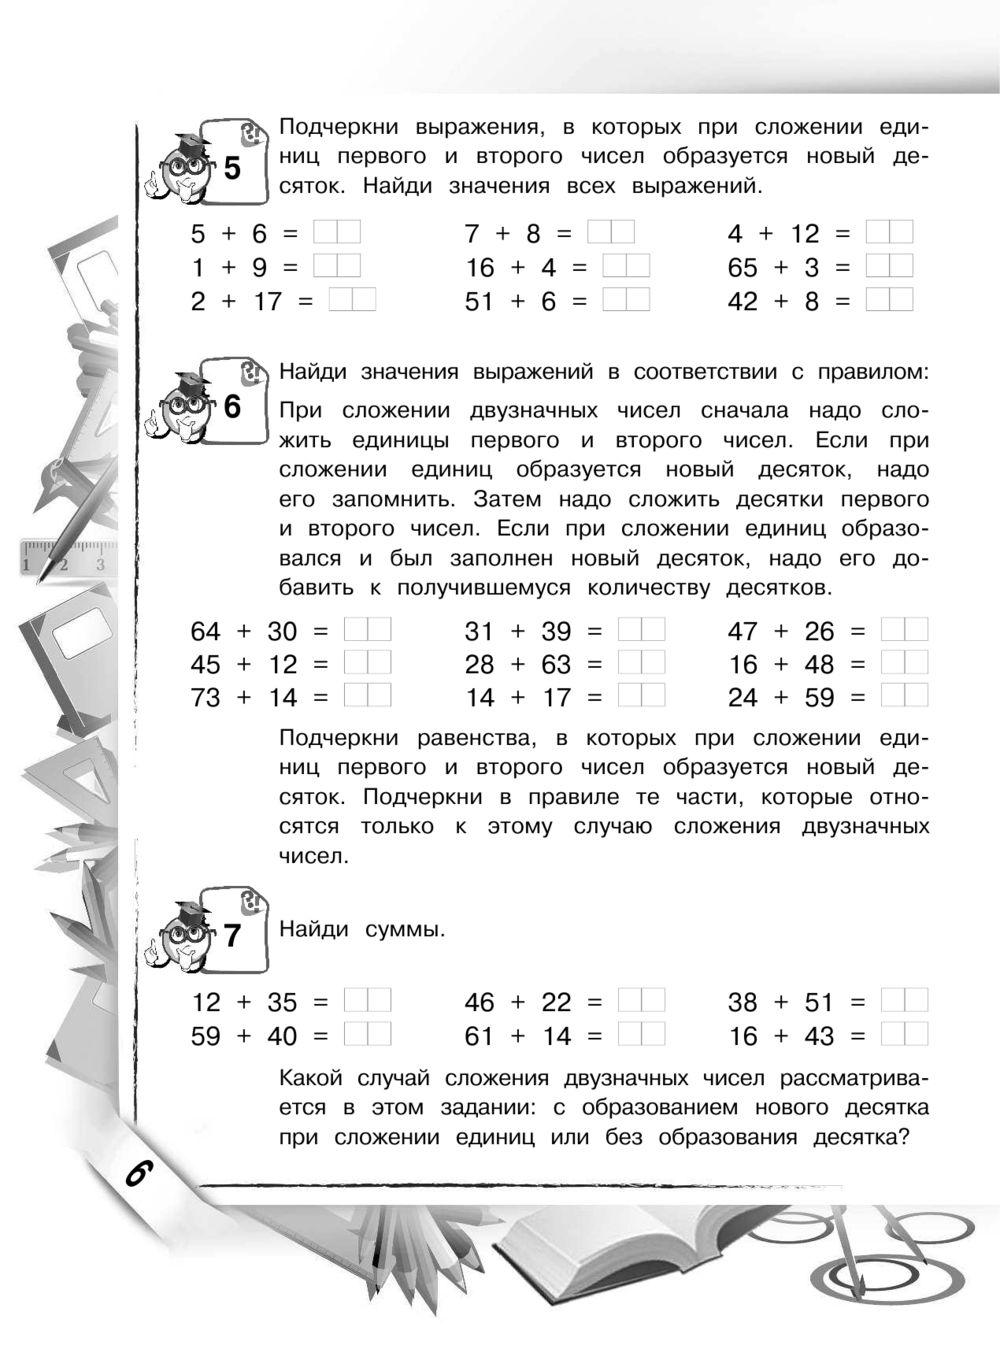 учебник 3 класс математика занков